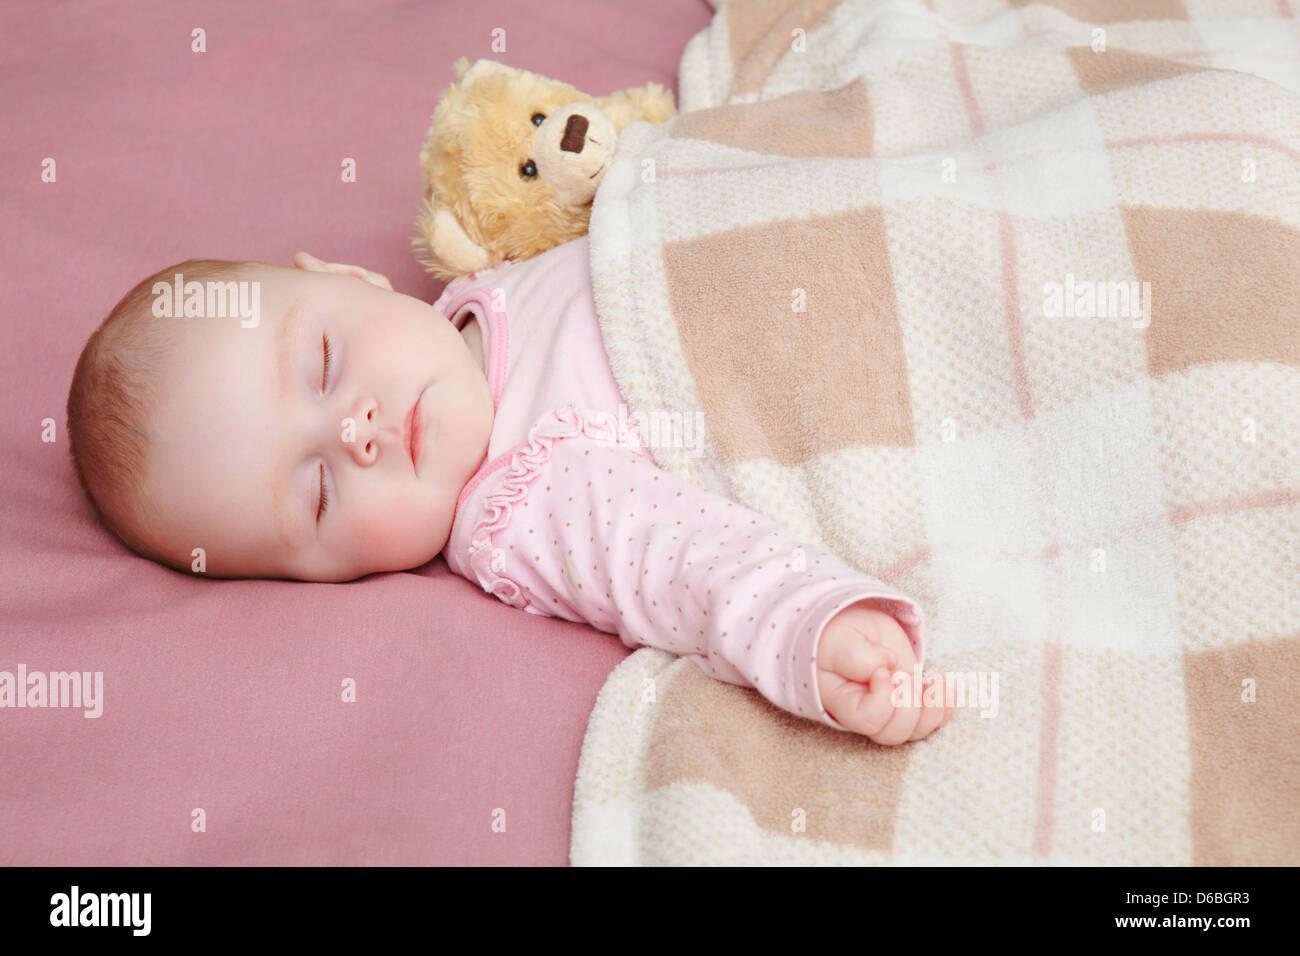 Baby girl sleeping in bed - Stock Image